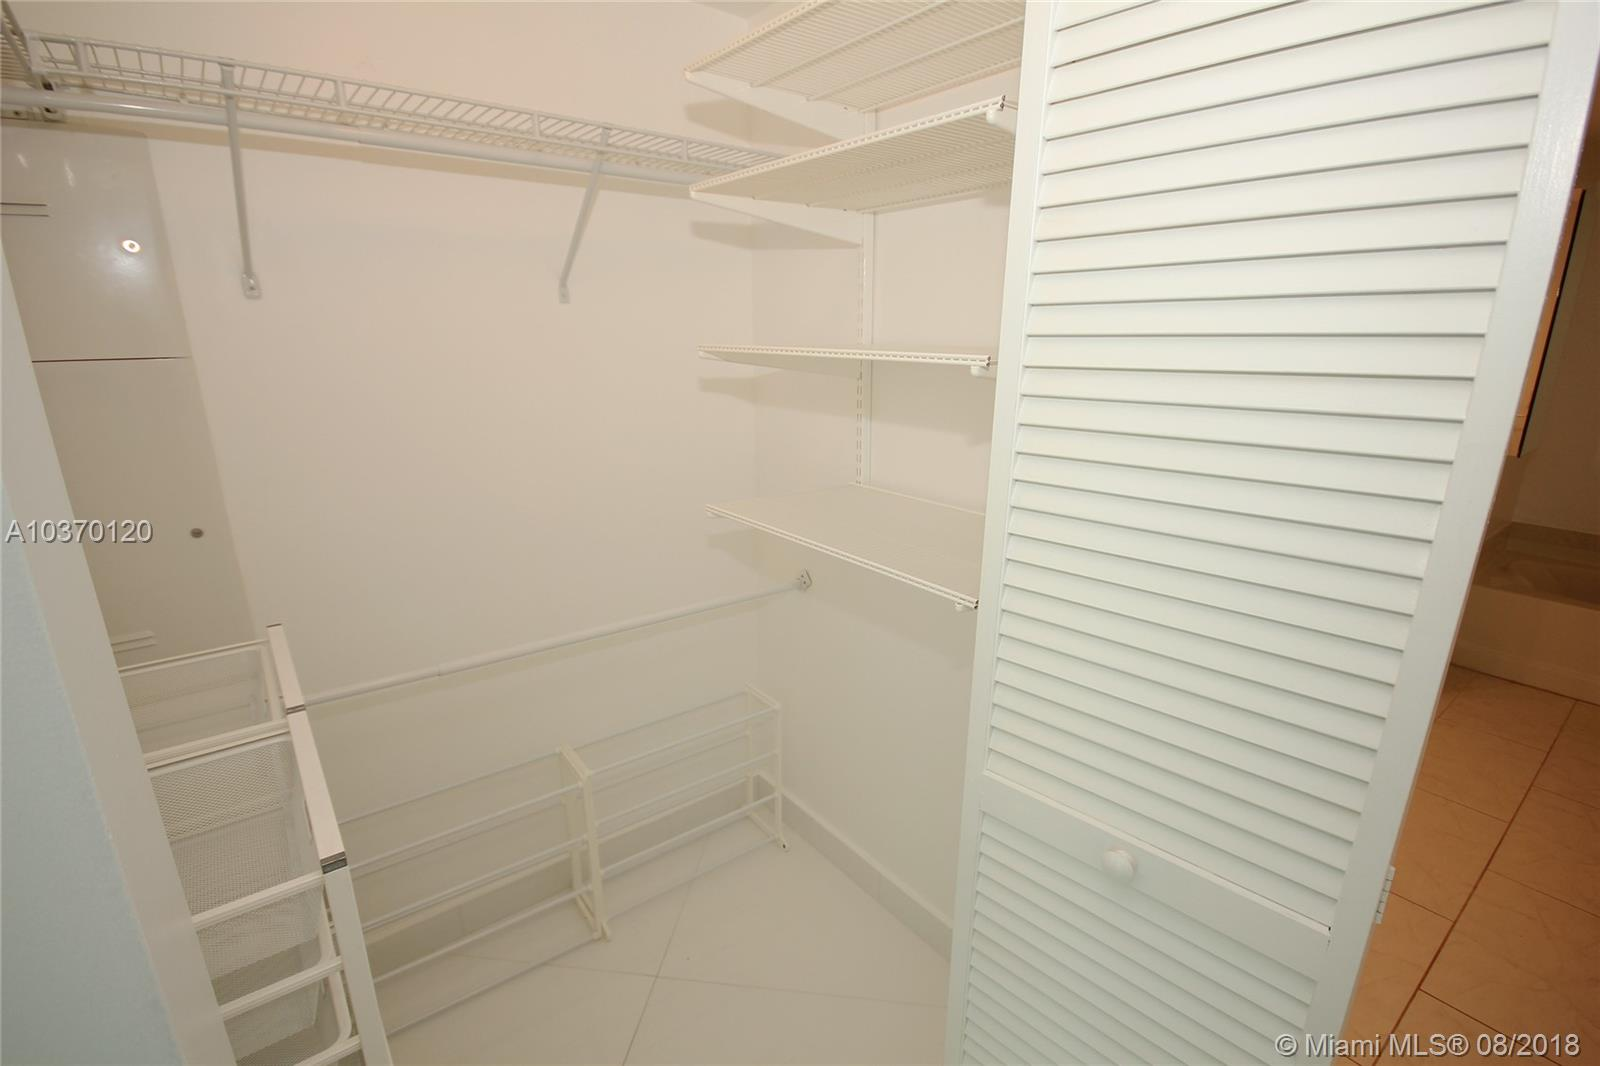 950 Brickell Bay Dr #2206, Miami FL, 33131   MLS# A10370120   Closed ...